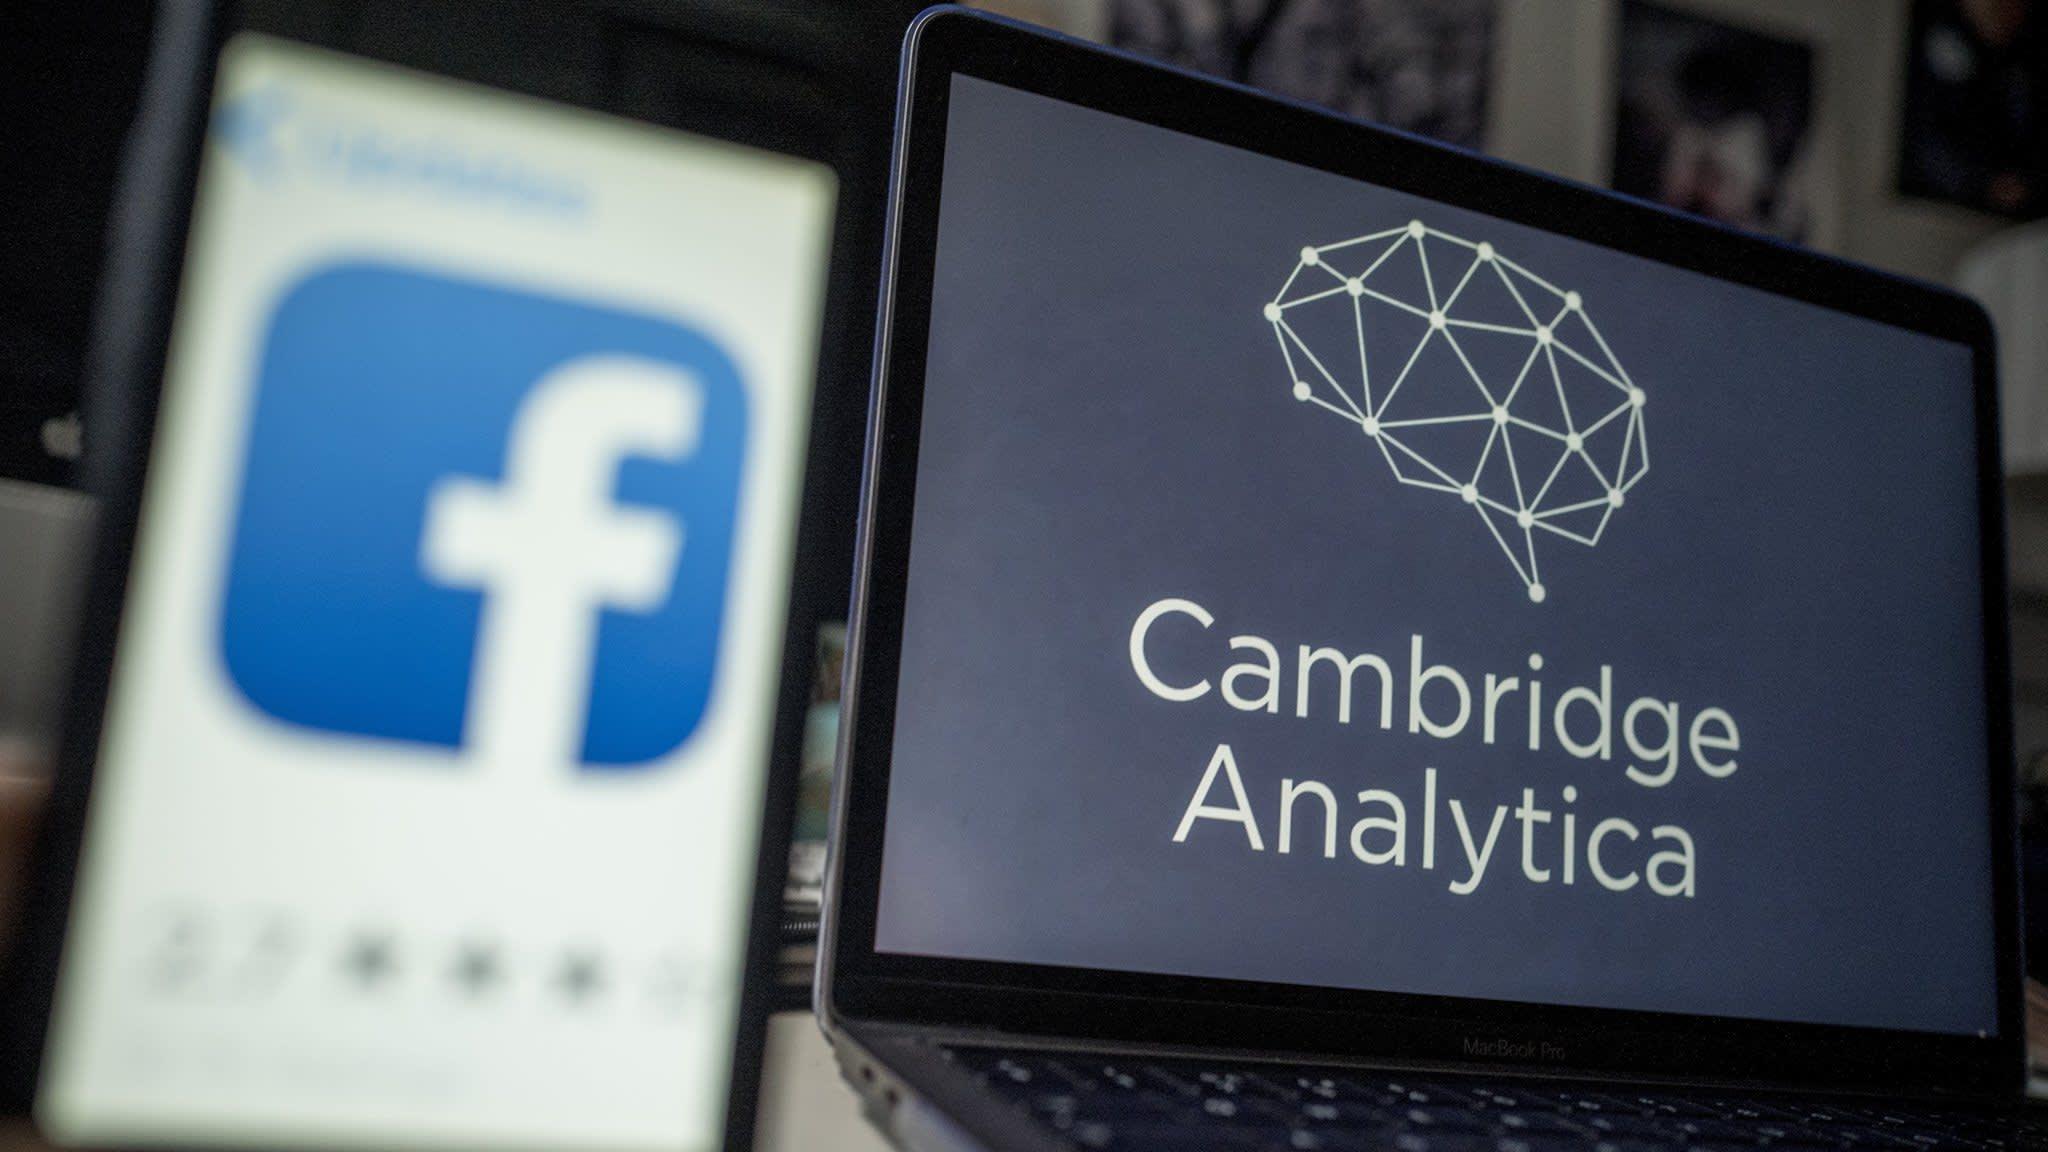 Cambridge Analytica video revelations add pressure on data firm